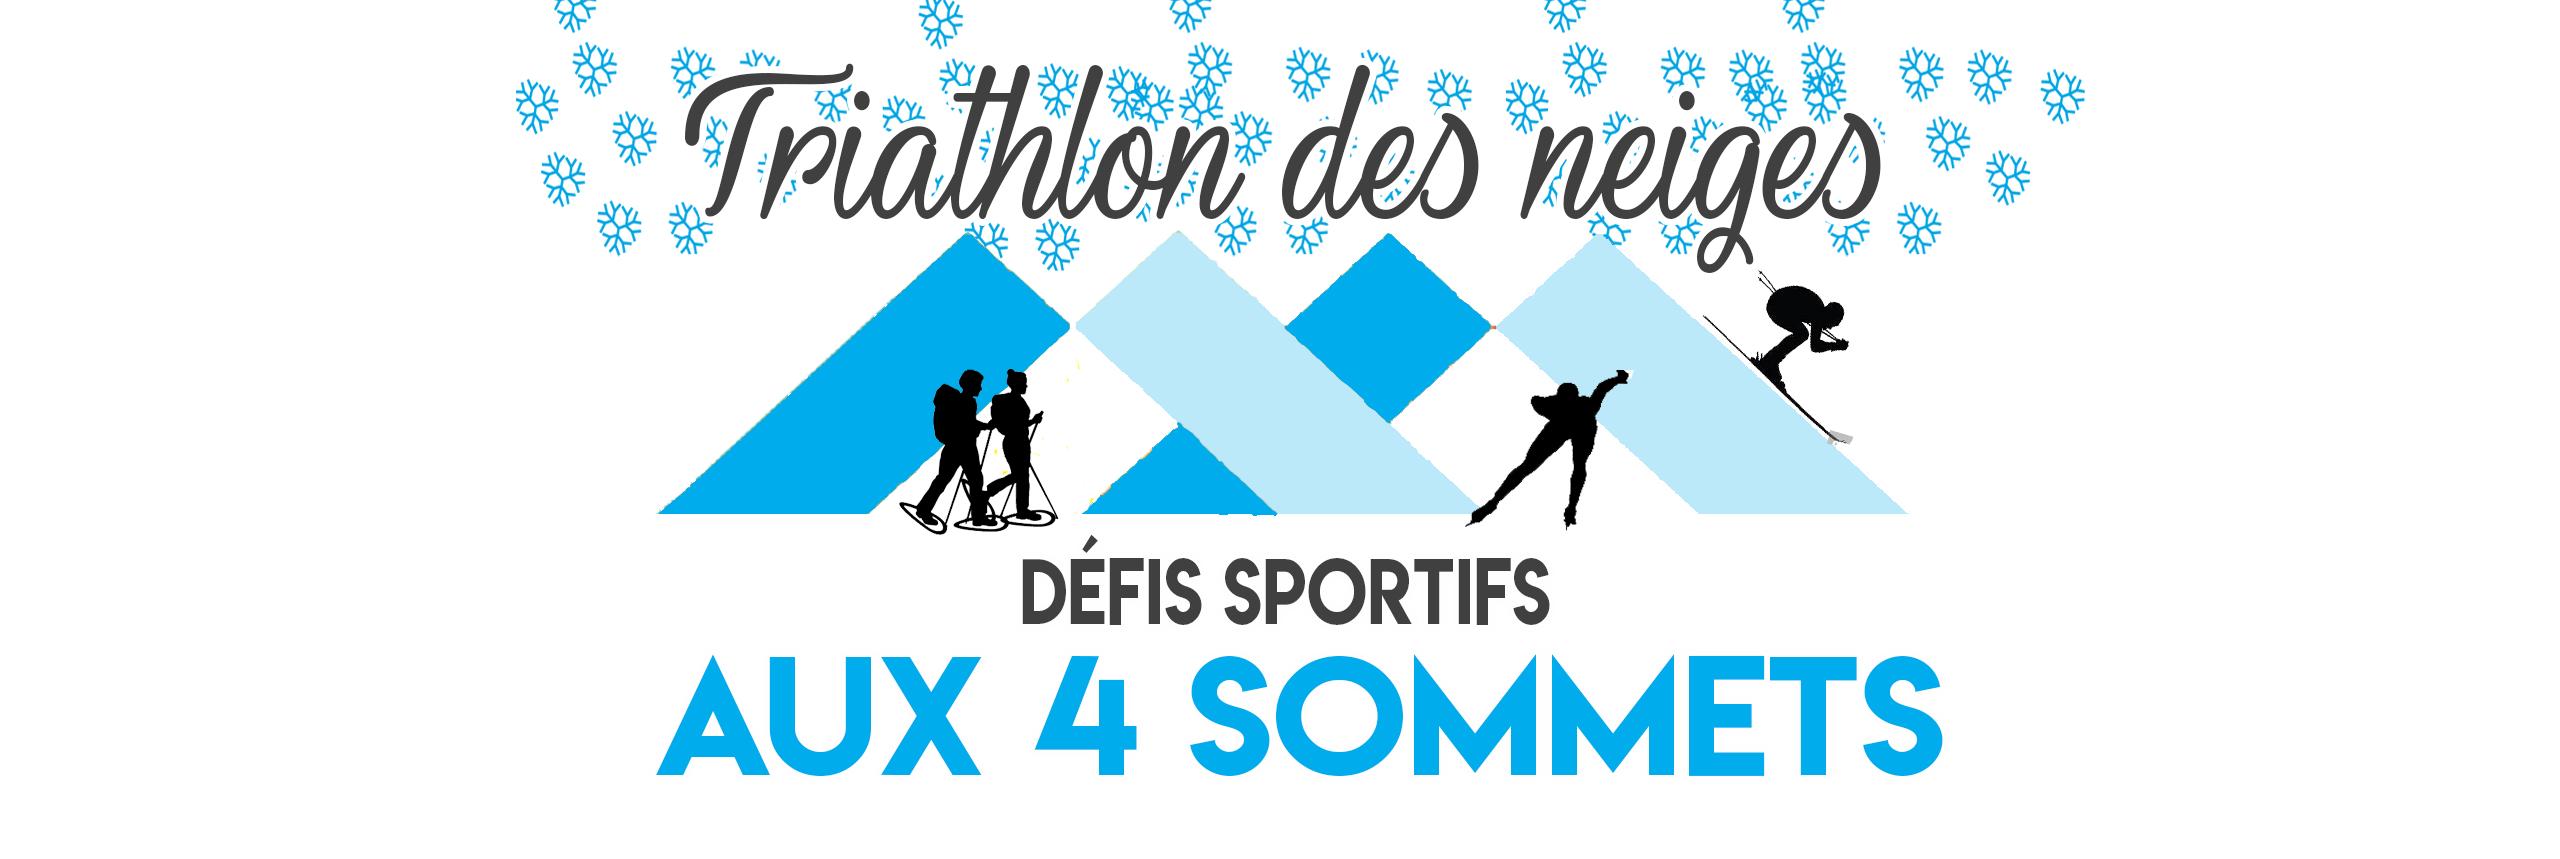 https://www.aux4sommets.com/wp-content/uploads/2014/05/logo-upload.png